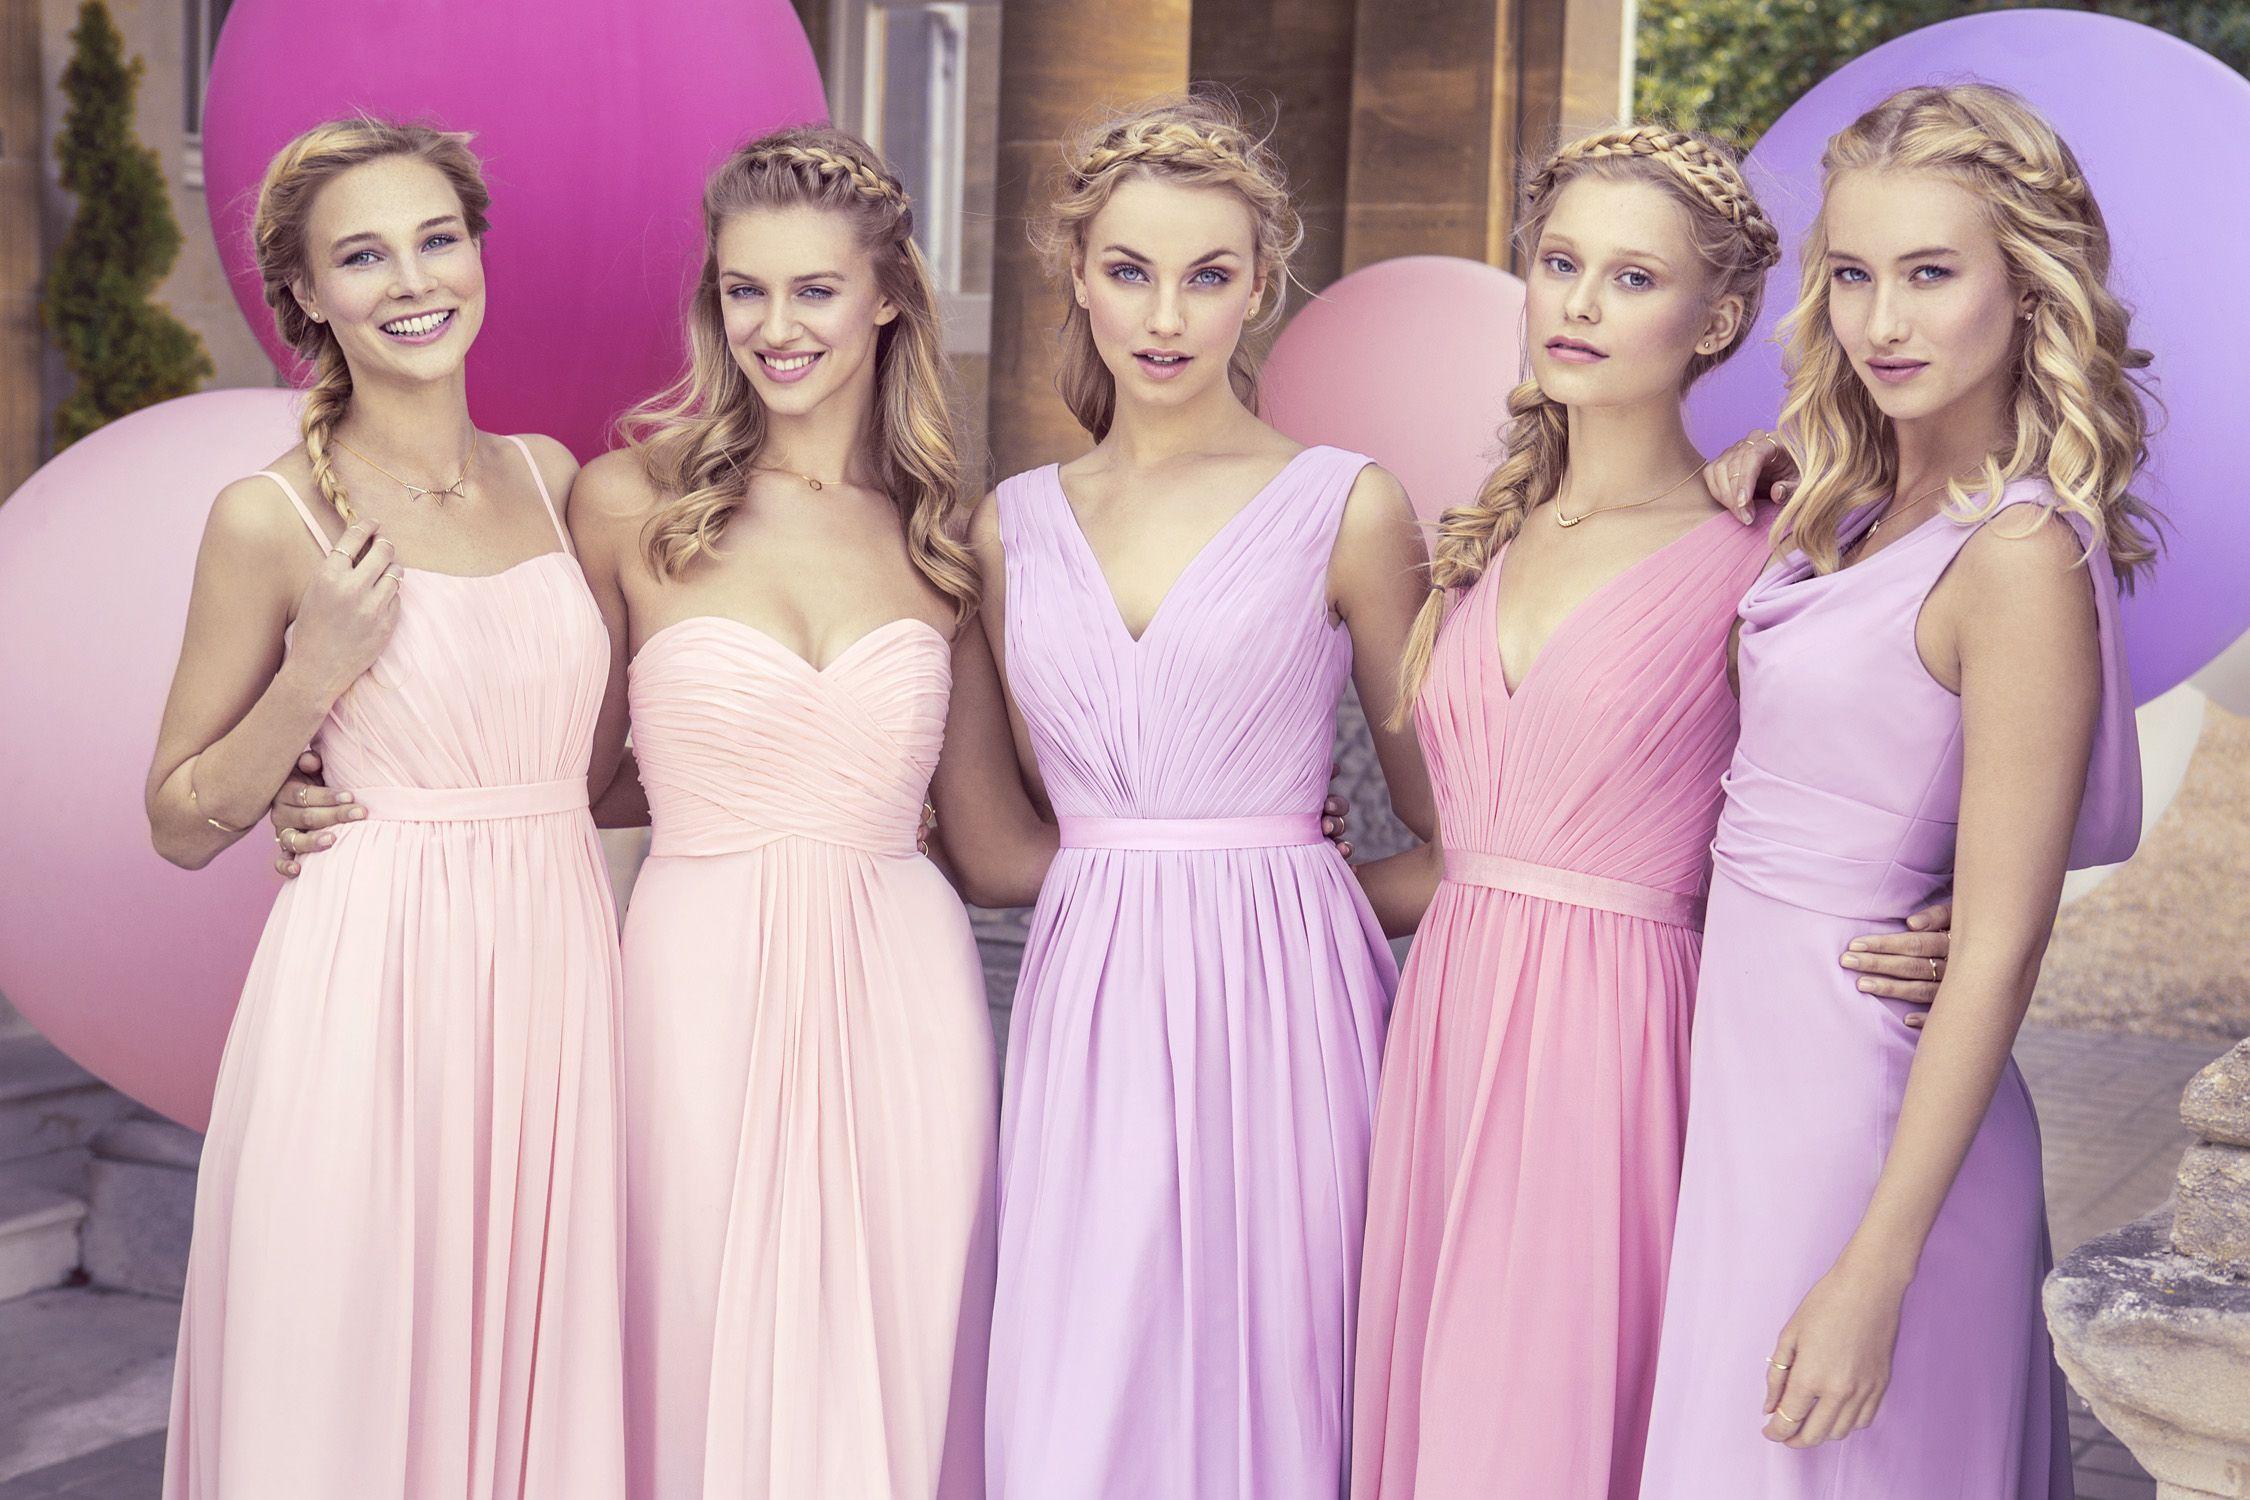 Pastel pink bridesmaid dress  The kelsey rose bridesmaids  collection wedding dresses